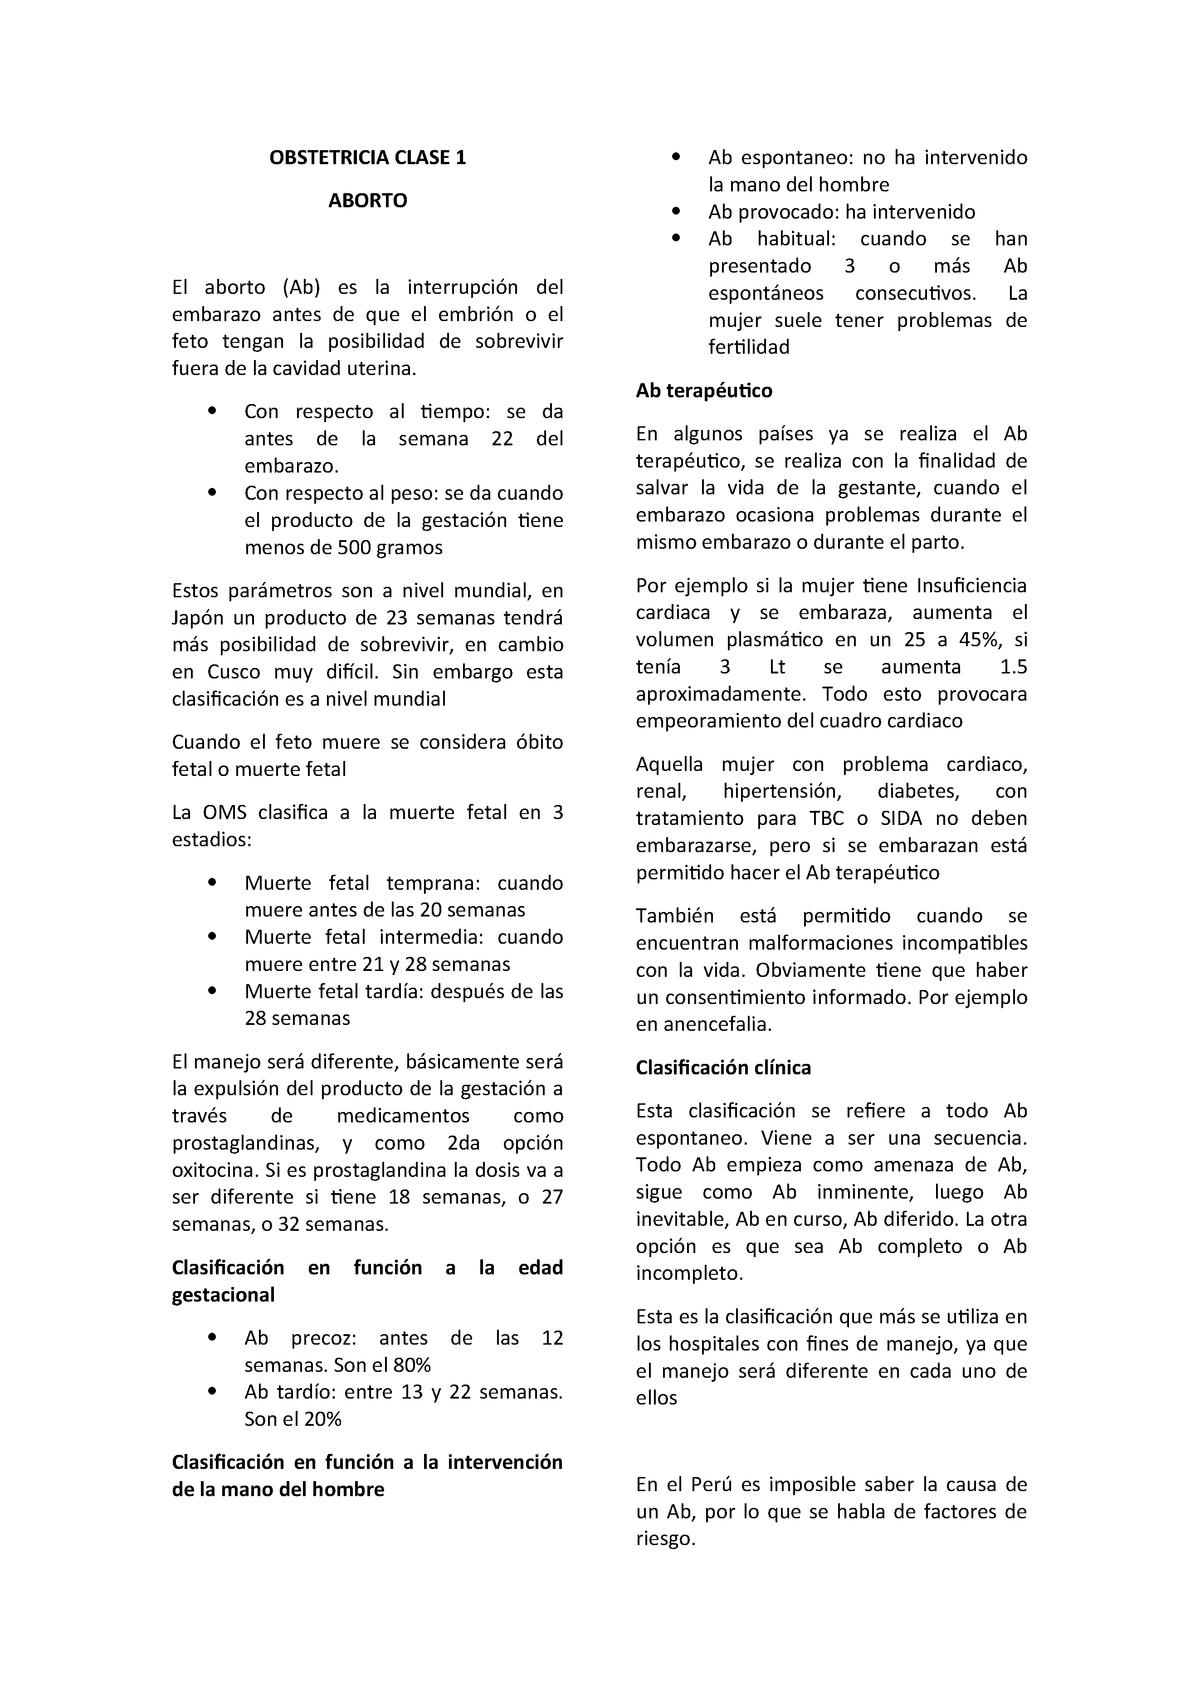 diagnóstico de útero septado de diabetes